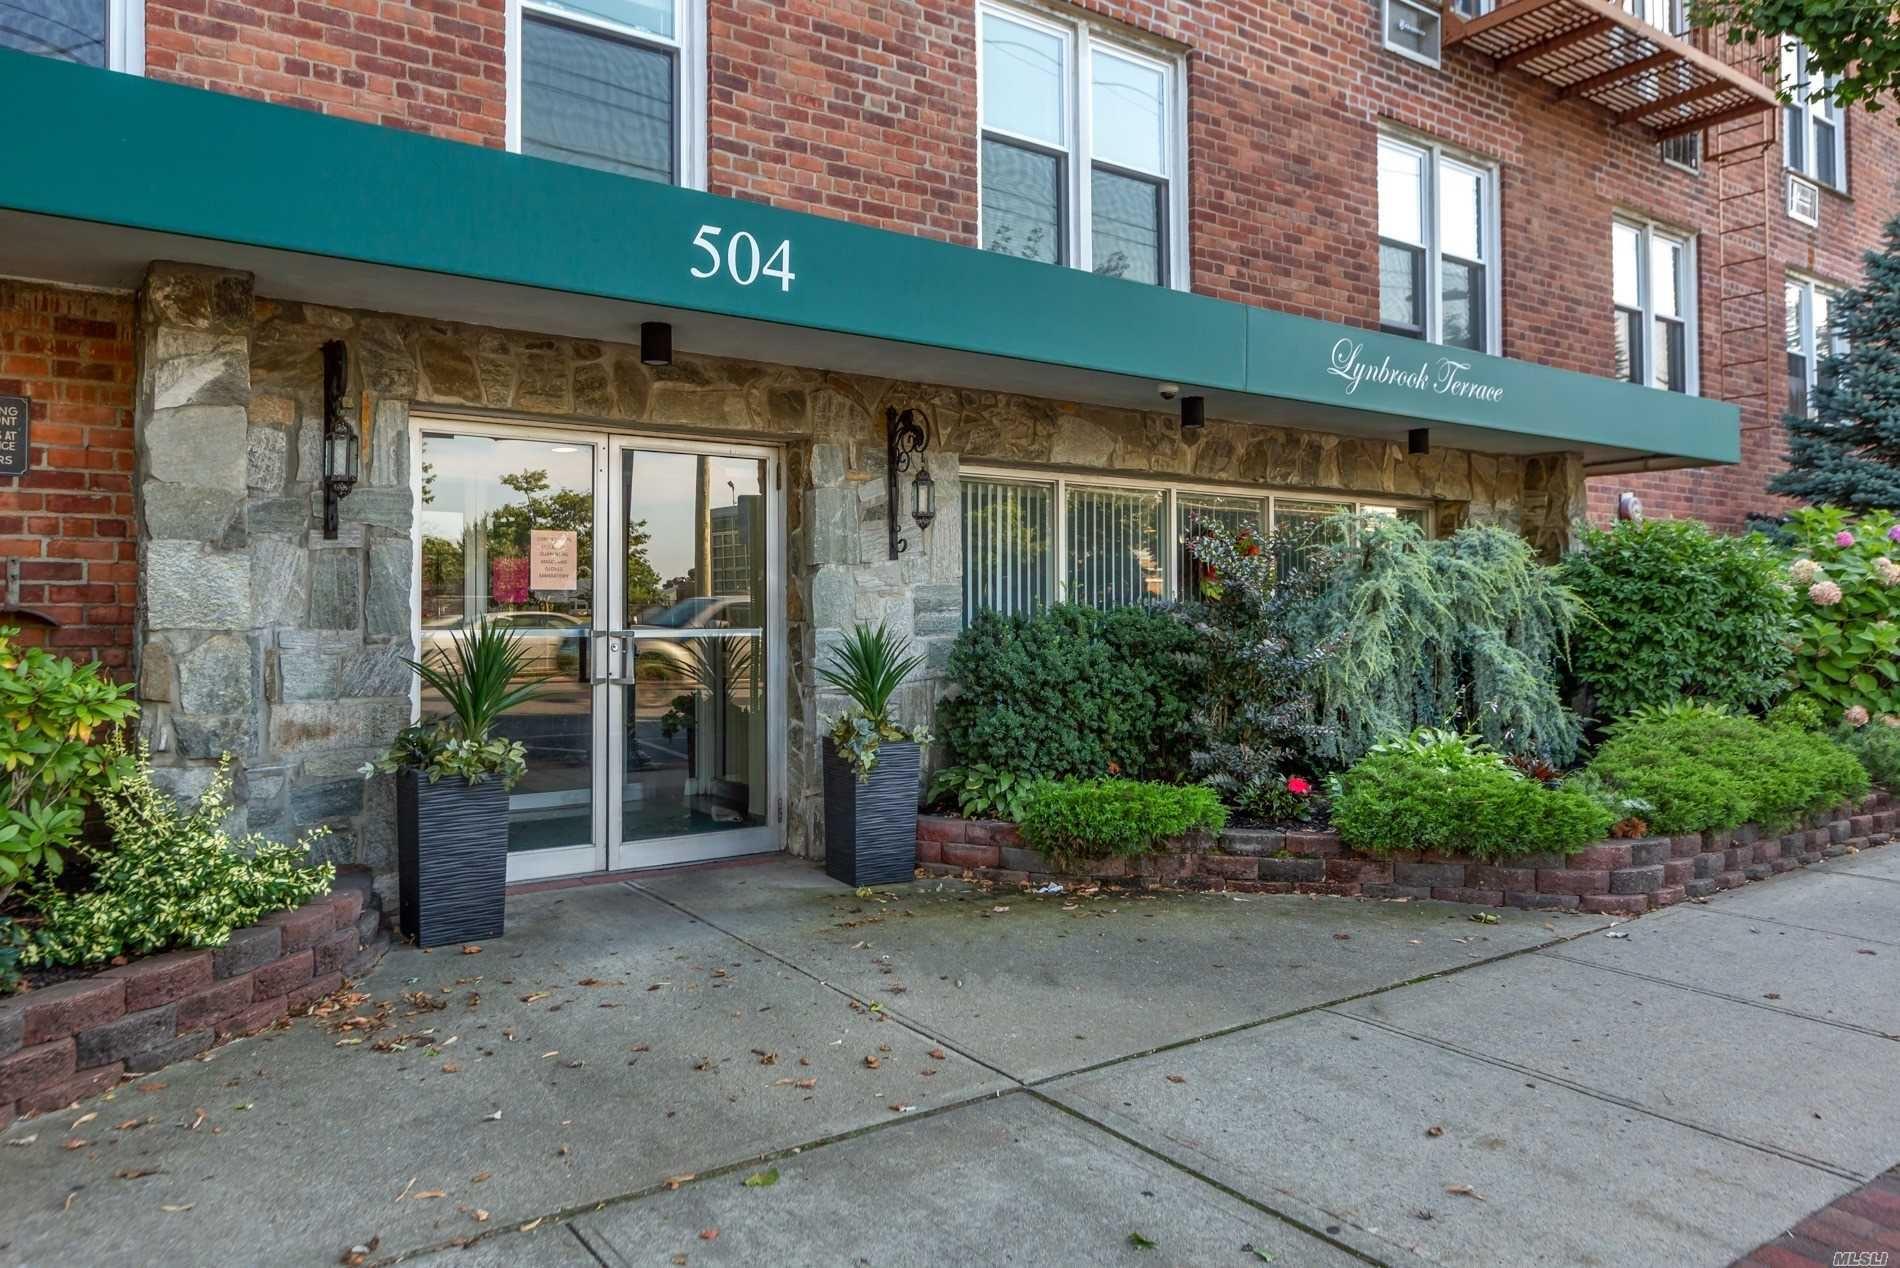 504 Merrick Road #4G, Lynbrook, NY 11563 - MLS#: 3237504